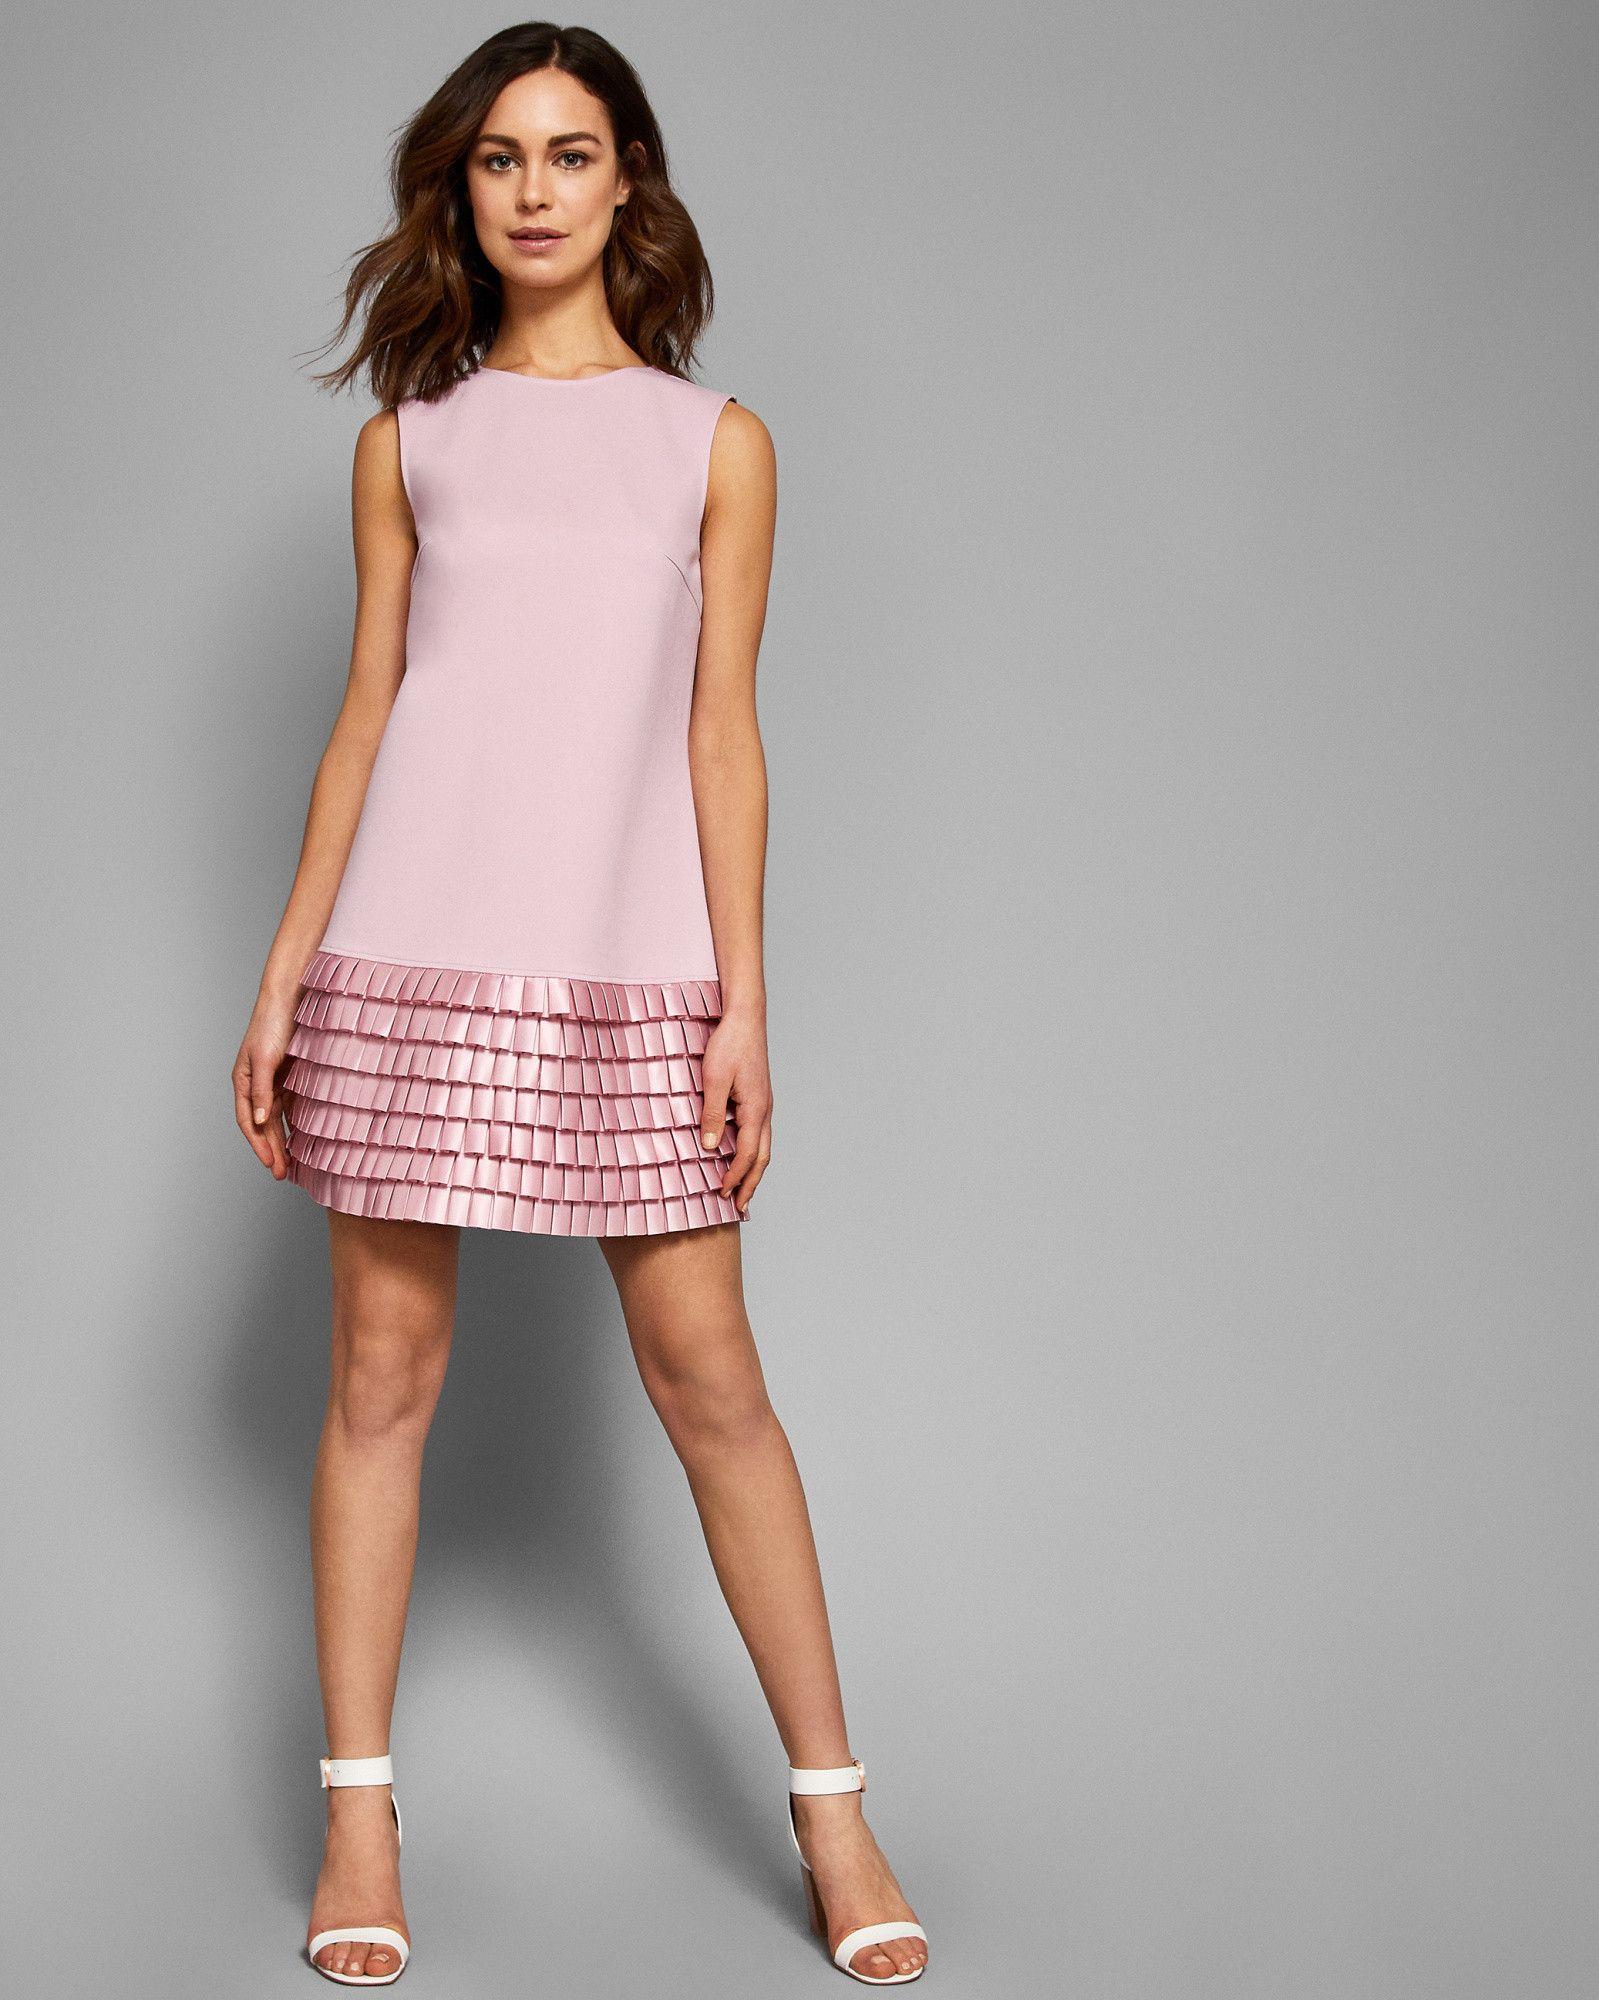 2b7264419 MARGGIA Satin loop shift dress  TedToToe Ted Baker Fashion